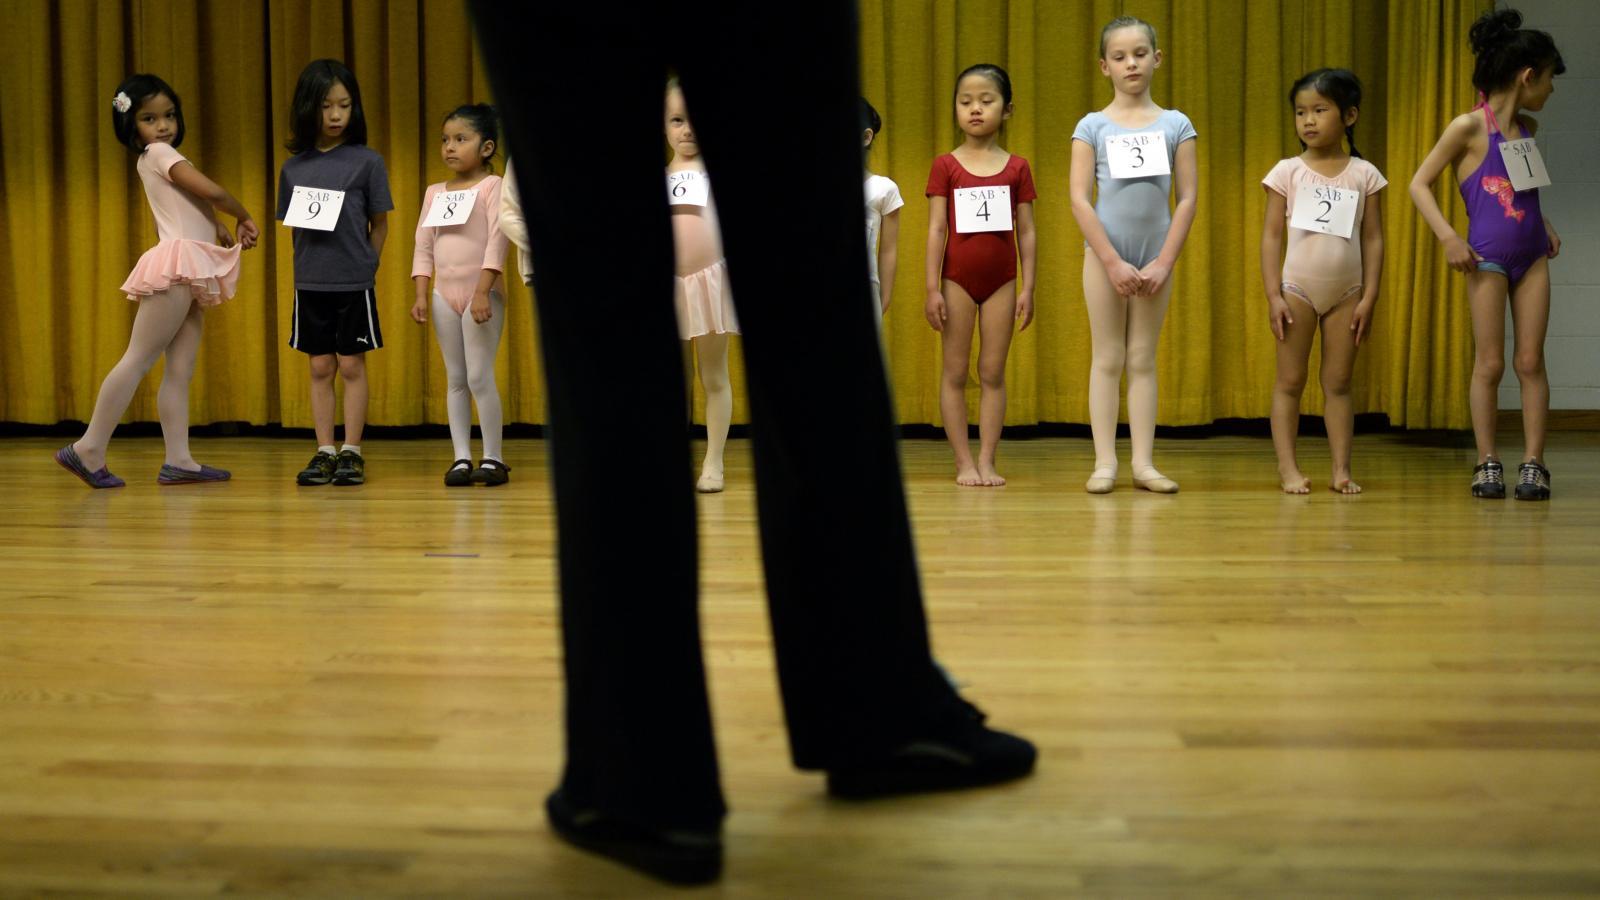 A teacher stands before a class of child ballerinas during an audition.